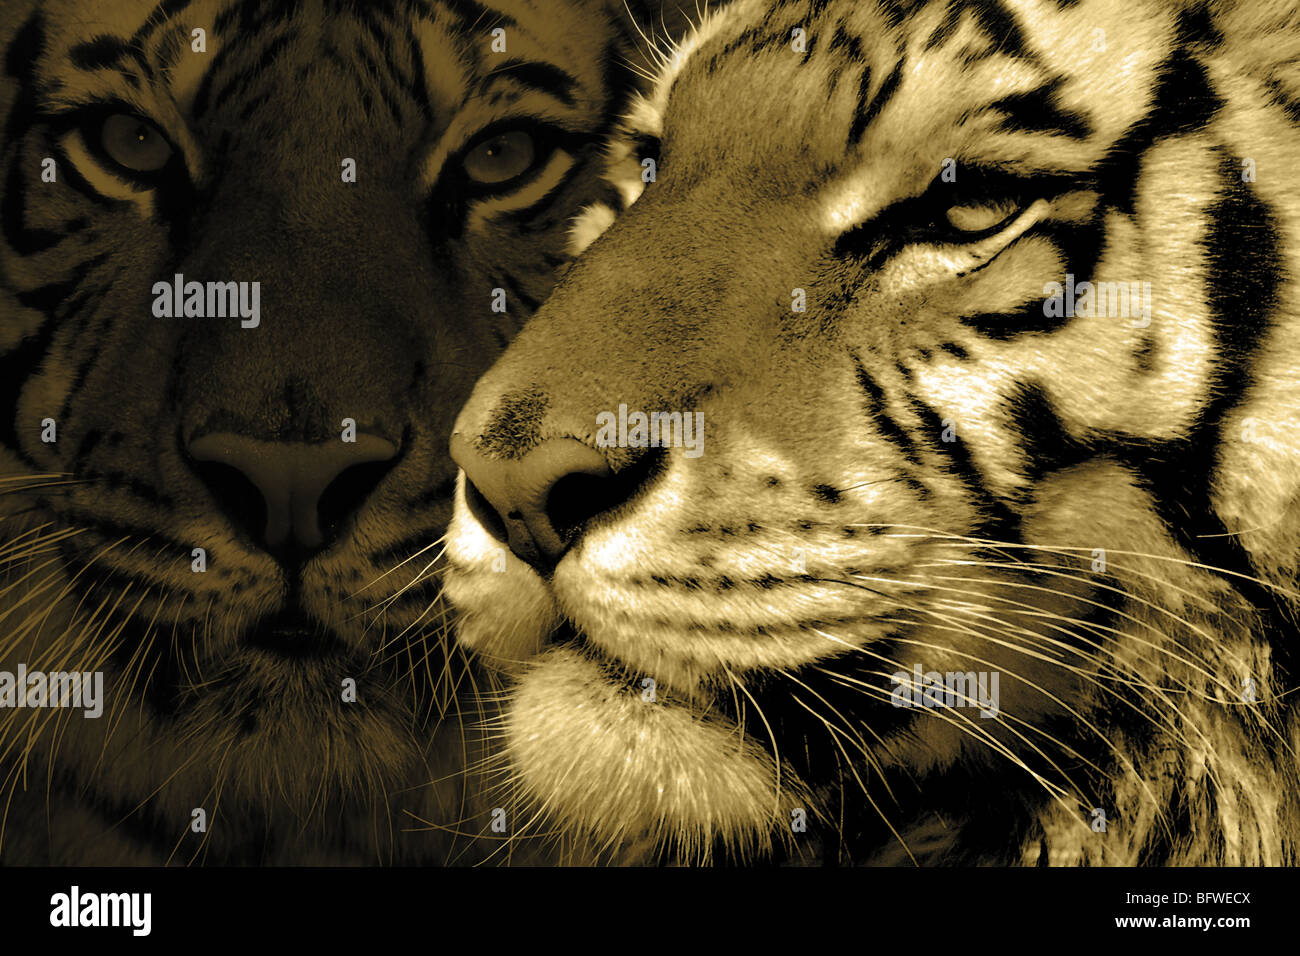 TIGER, TIGER - Stock Image